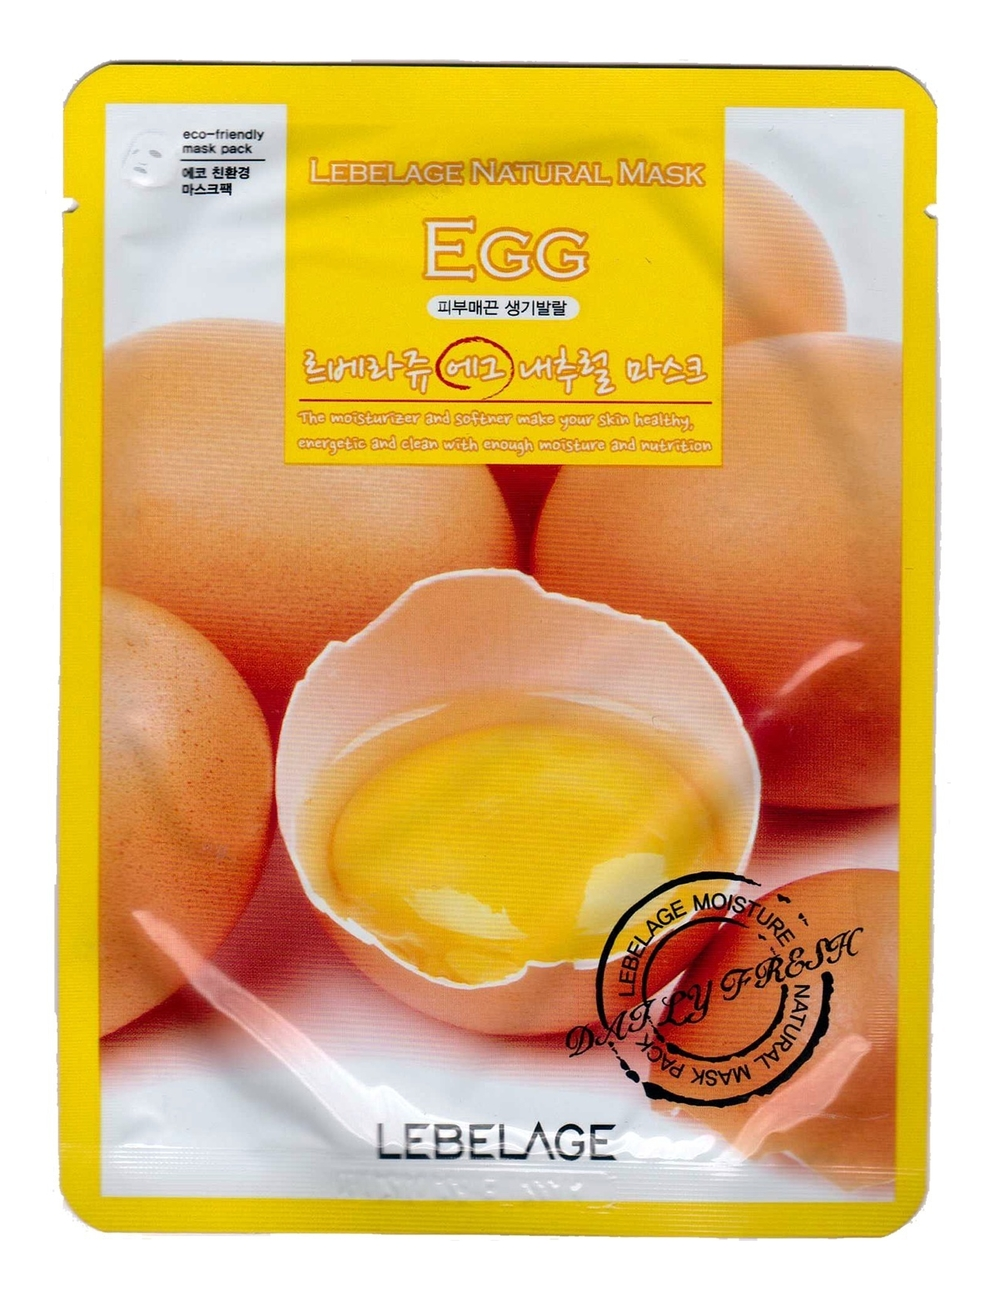 Тканевая маска для лица с экстрактом яйца Egg Natural Mask 23мл lebelage тканевая маска для лица с экстрактом яйца egg natural mask 23г